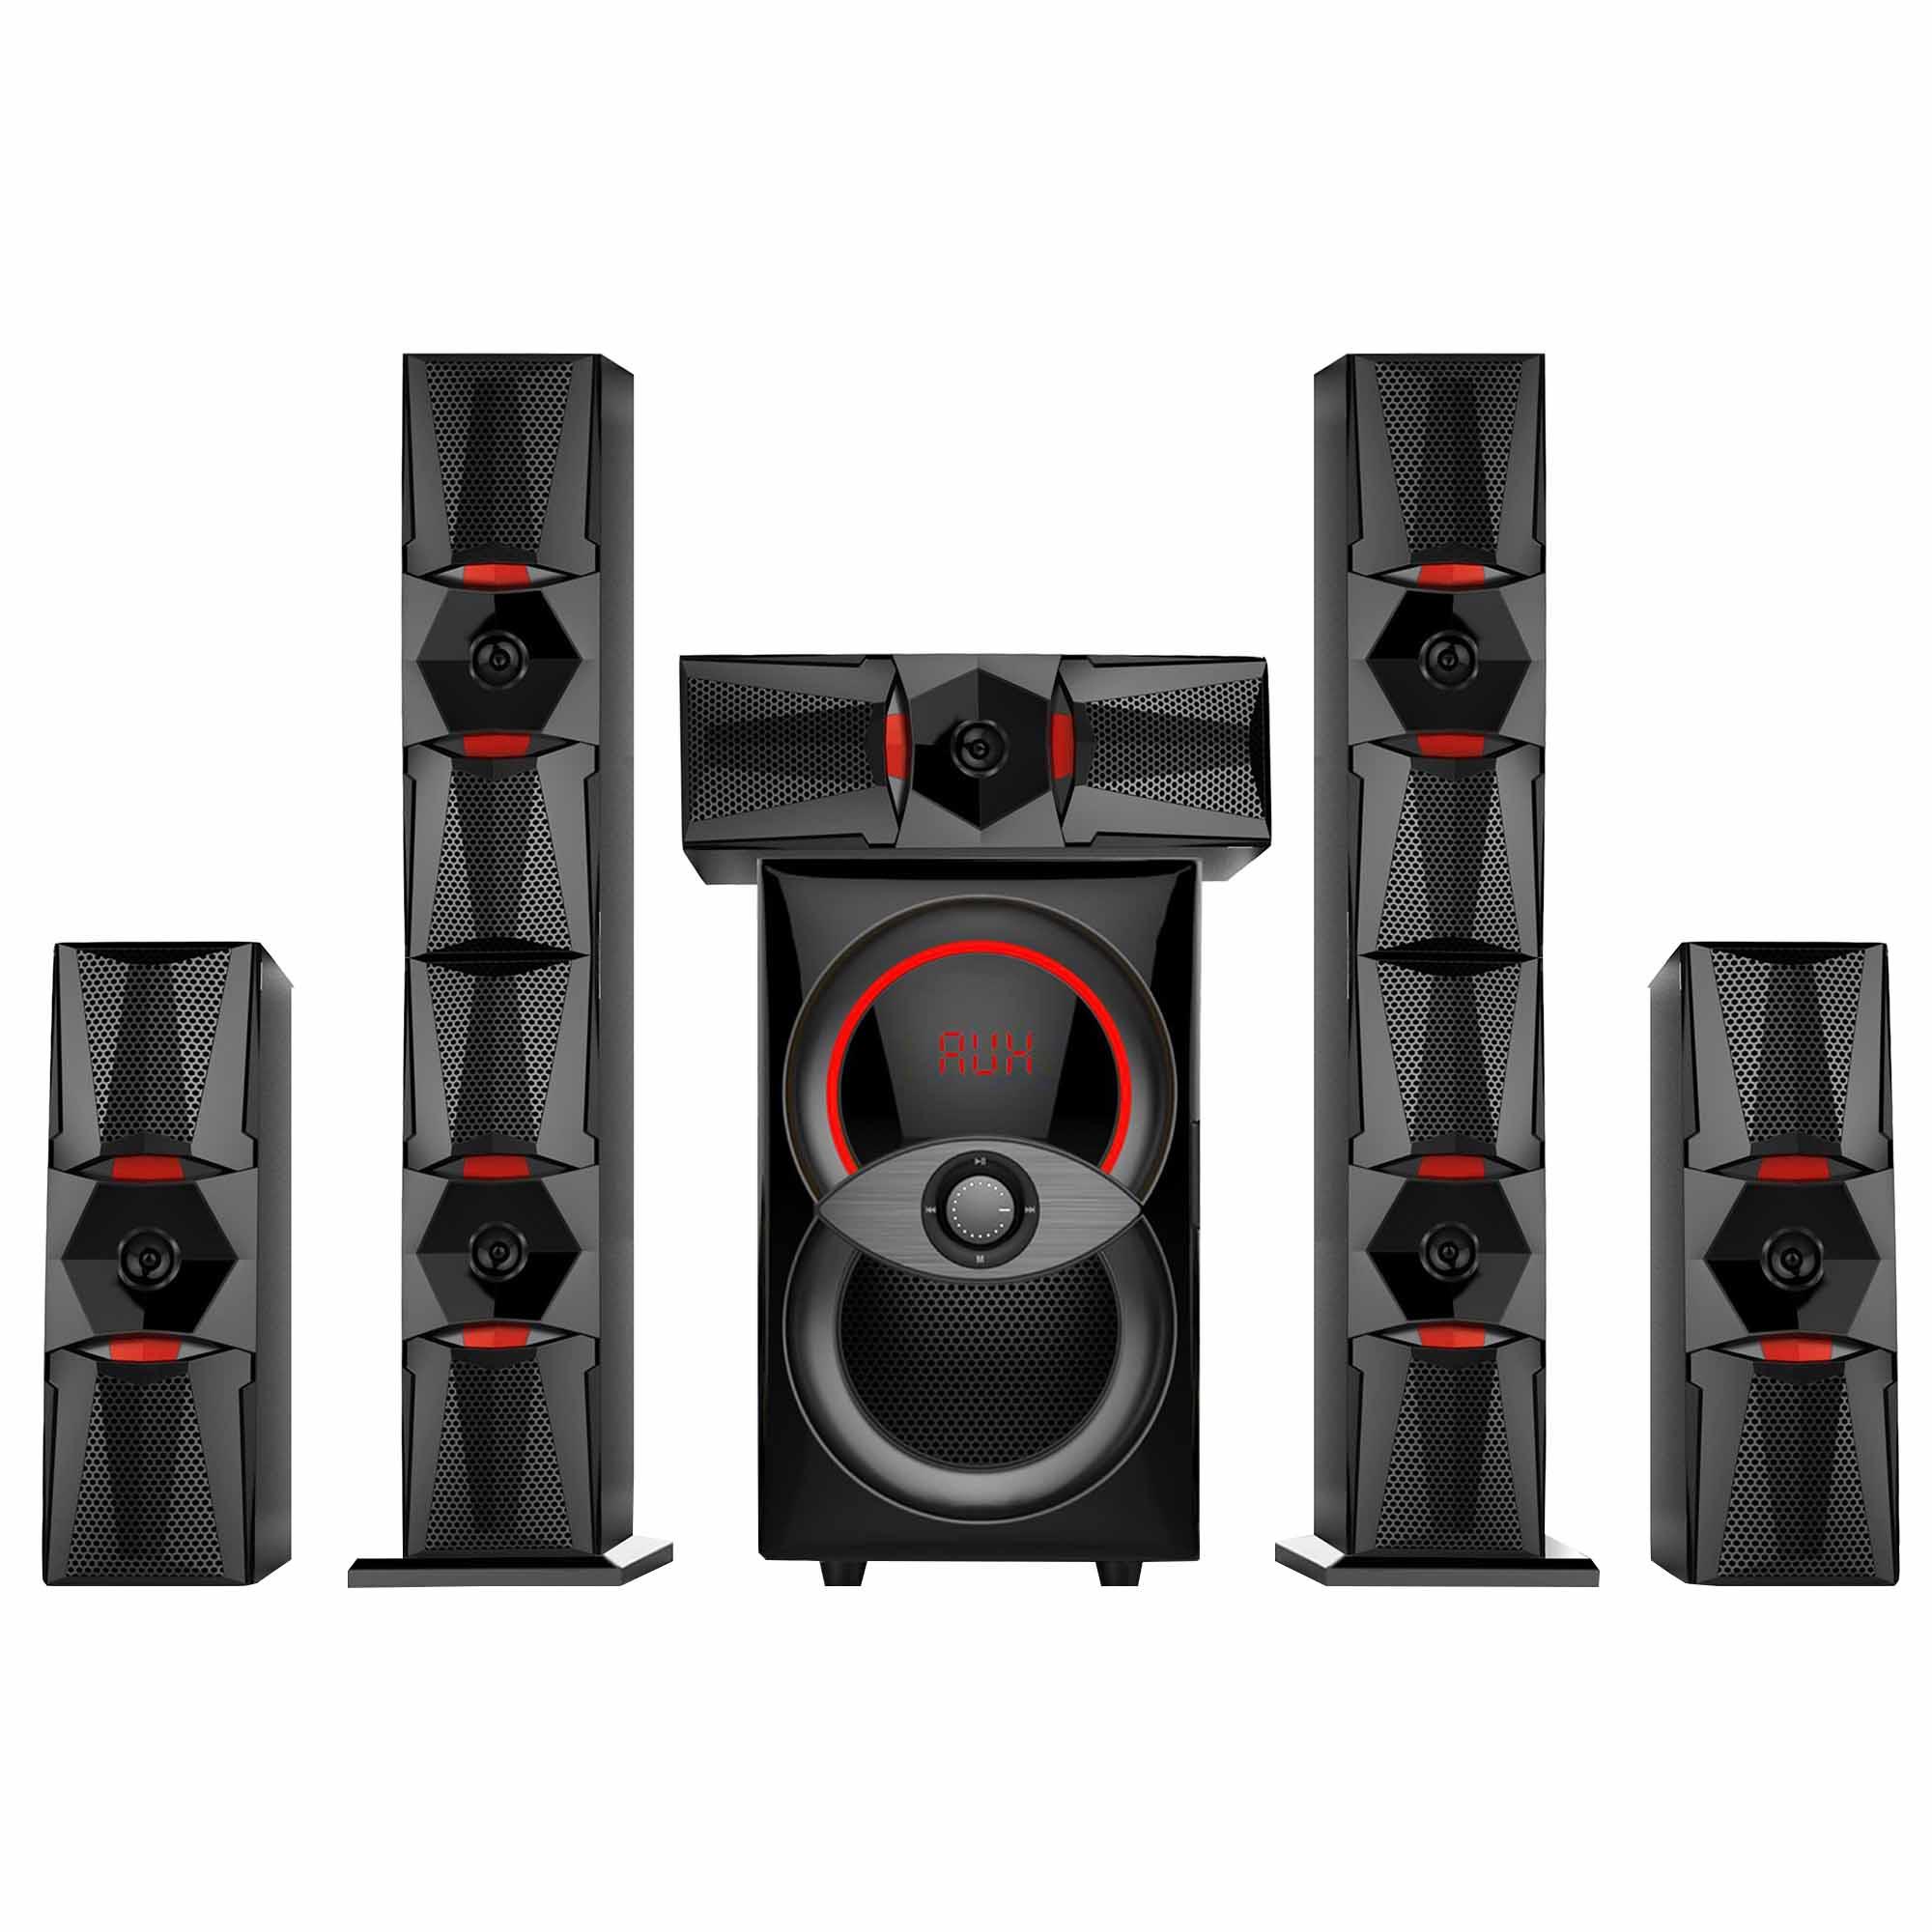 Fotografie Sistem boxe multimedia 5.1 Akai SS050A-6212H cu BT, USB, SD, MMC, Radio FM